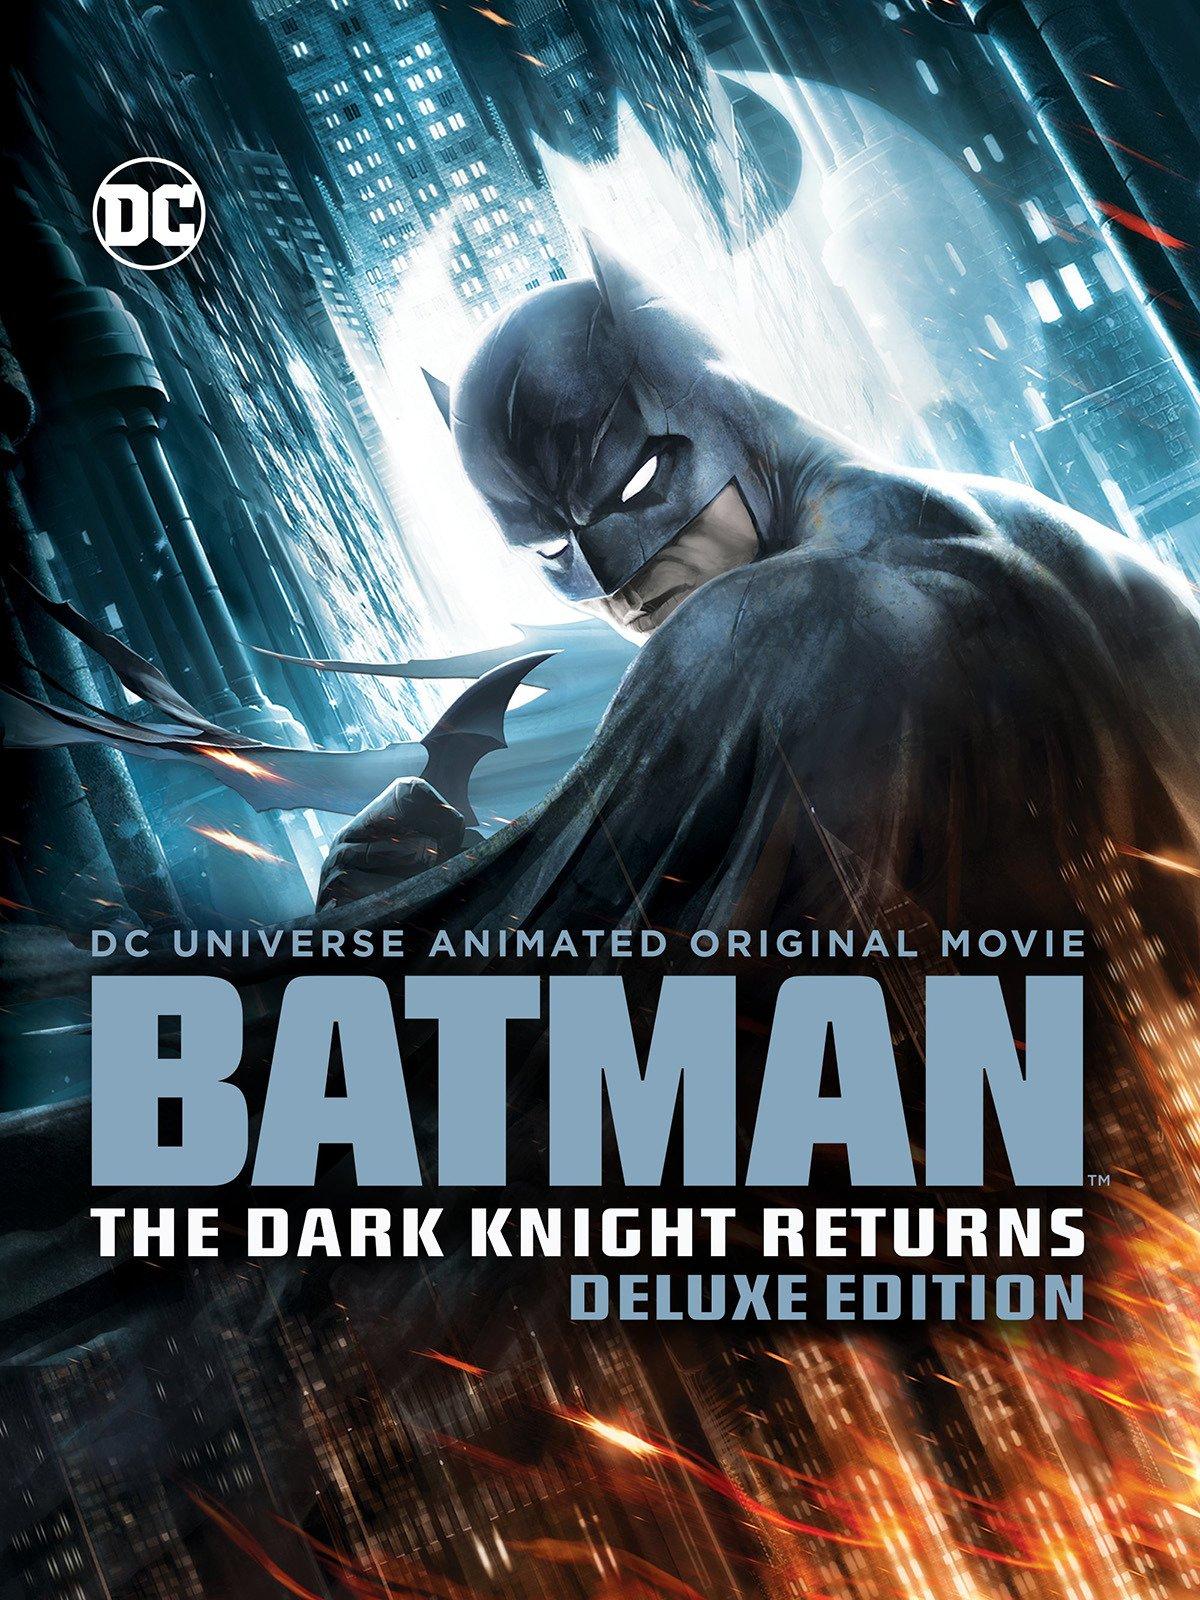 Watch Batman The Dark Knight Returns Part 1 And Part 2 Prime Video